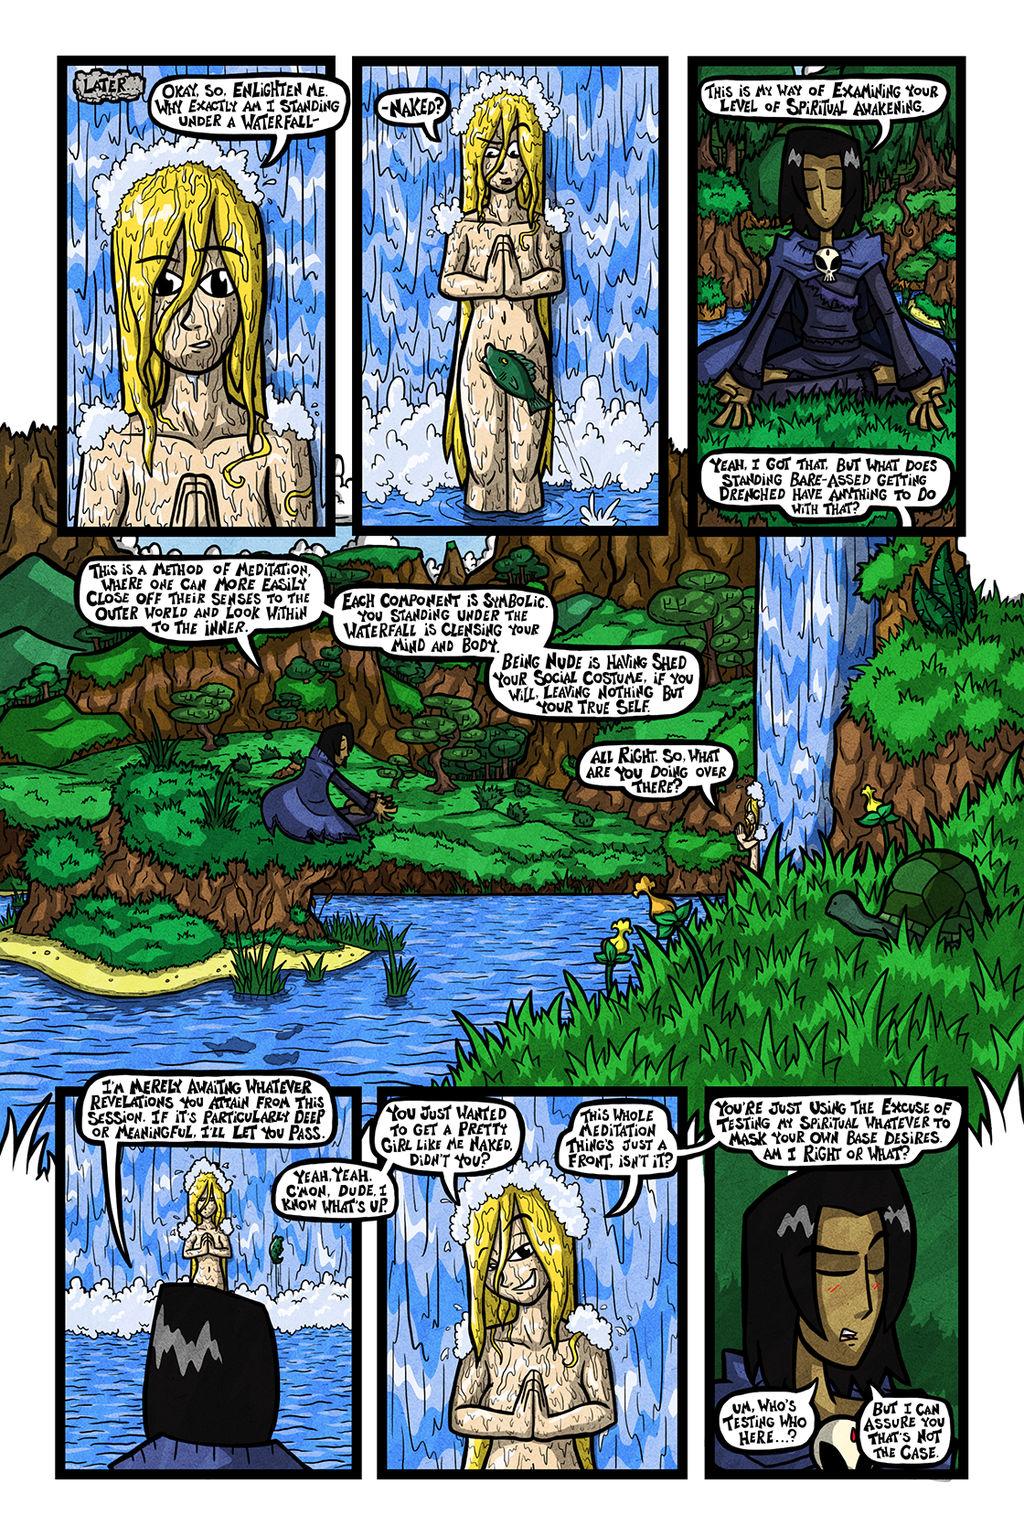 'Stone Punks' - Episode 1, Page 22